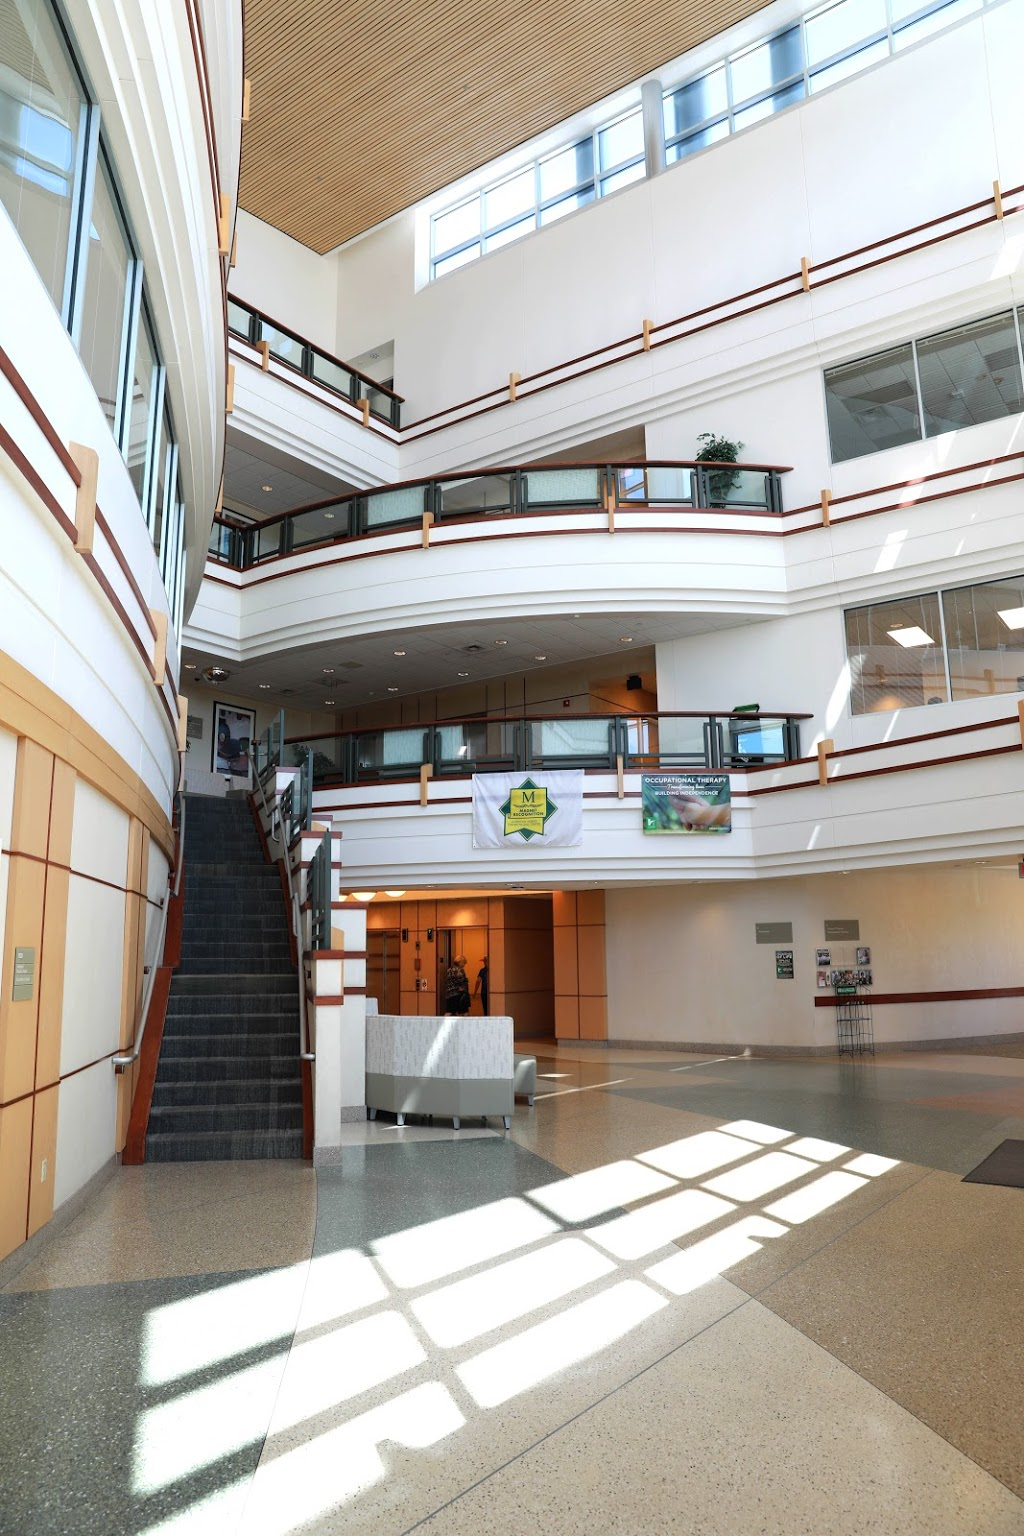 Hendricks Regional Health Plainfield Medical Center - hospital  | Photo 3 of 3 | Address: 1100 Southfield Dr, Plainfield, IN 46168, USA | Phone: (317) 837-5400